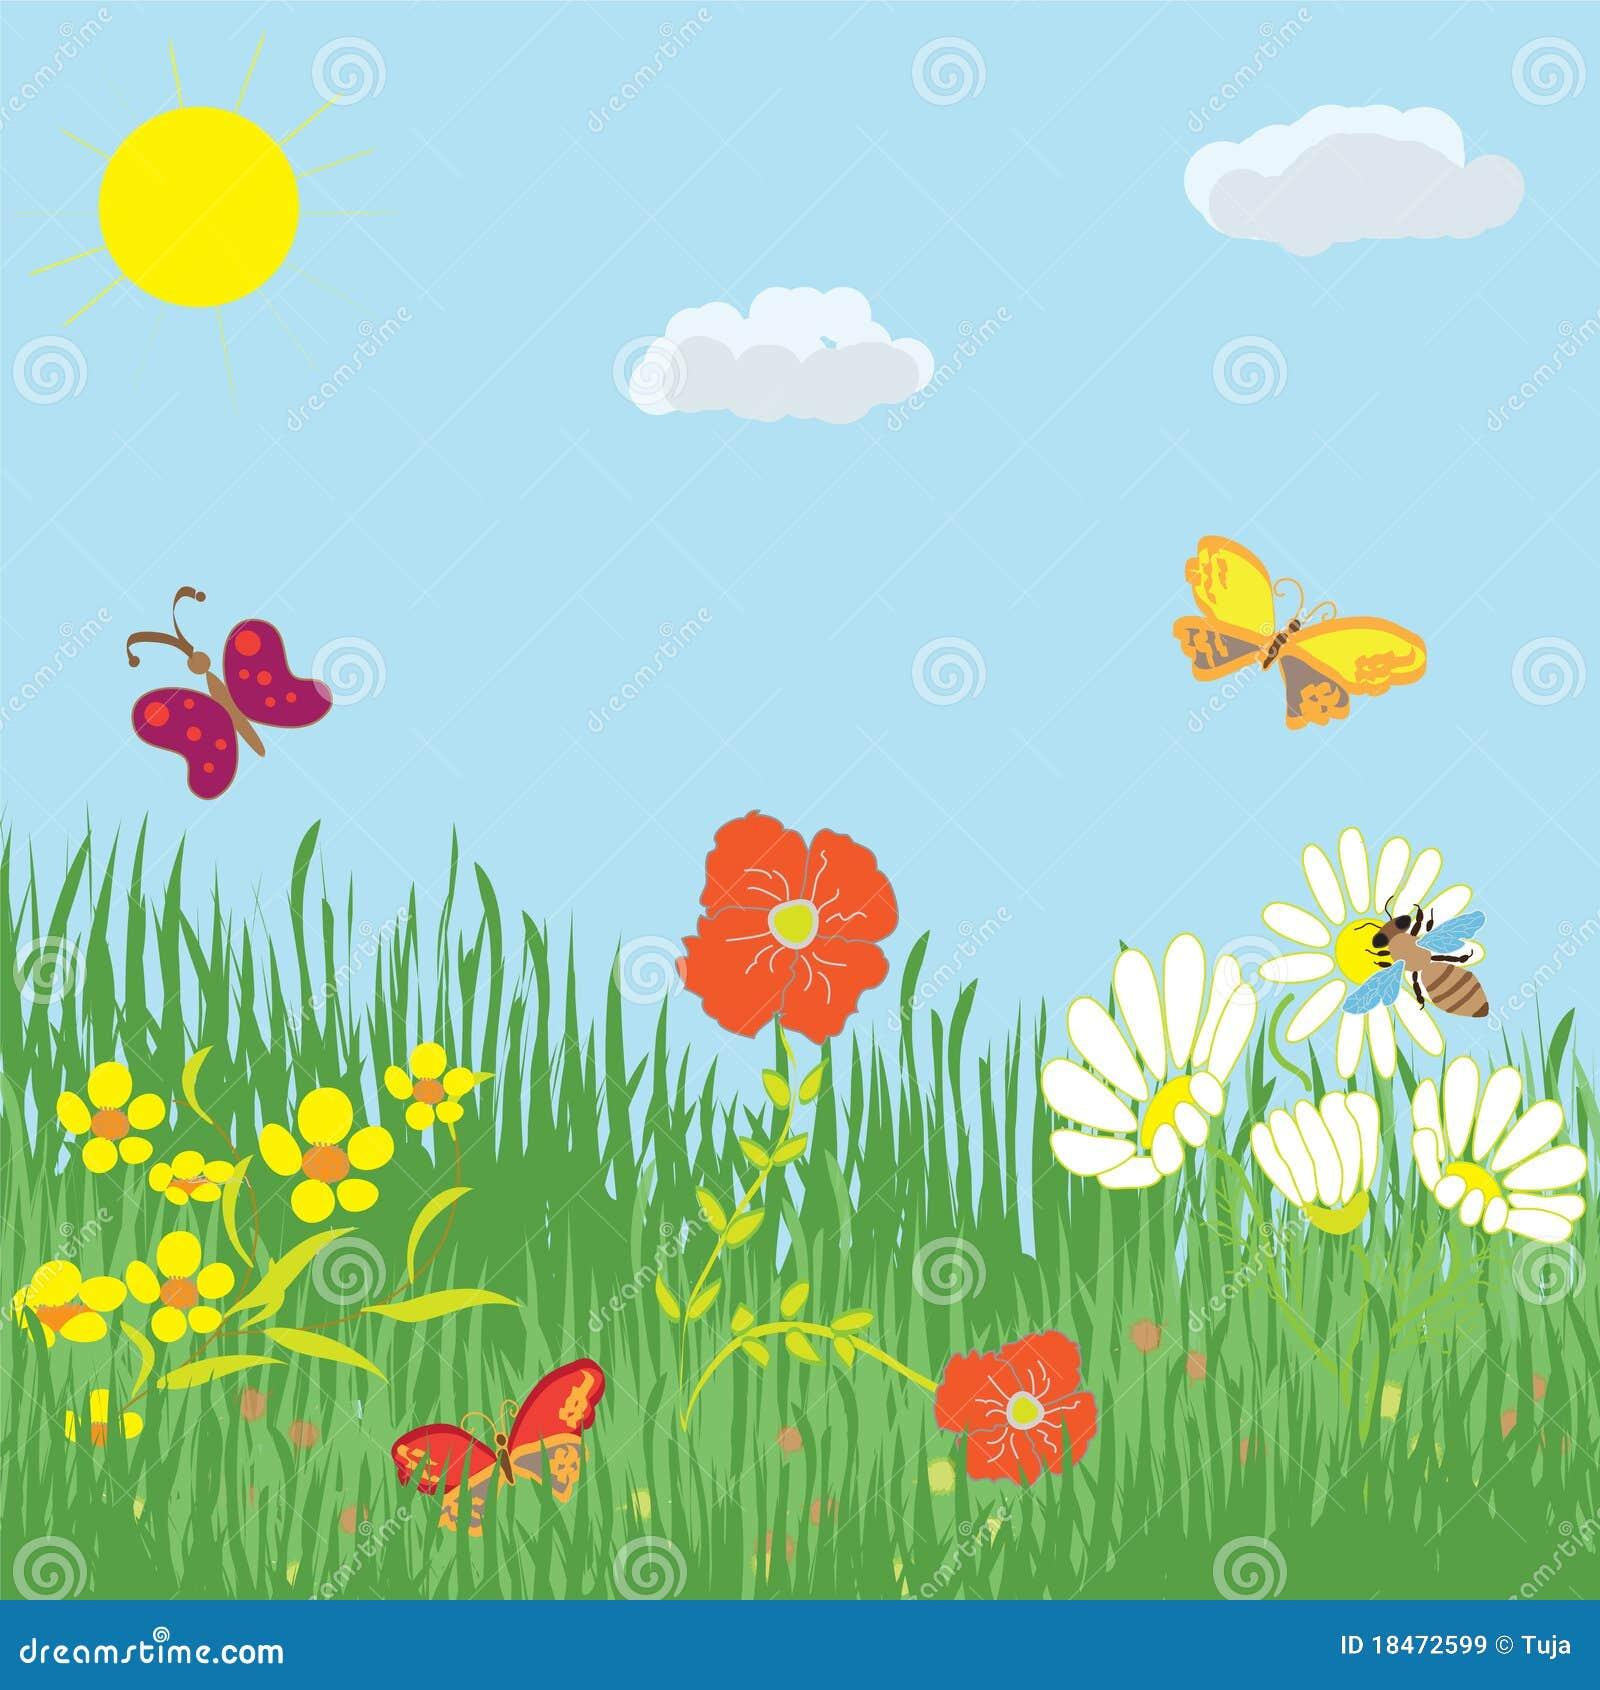 Рисунок солнышко и лето